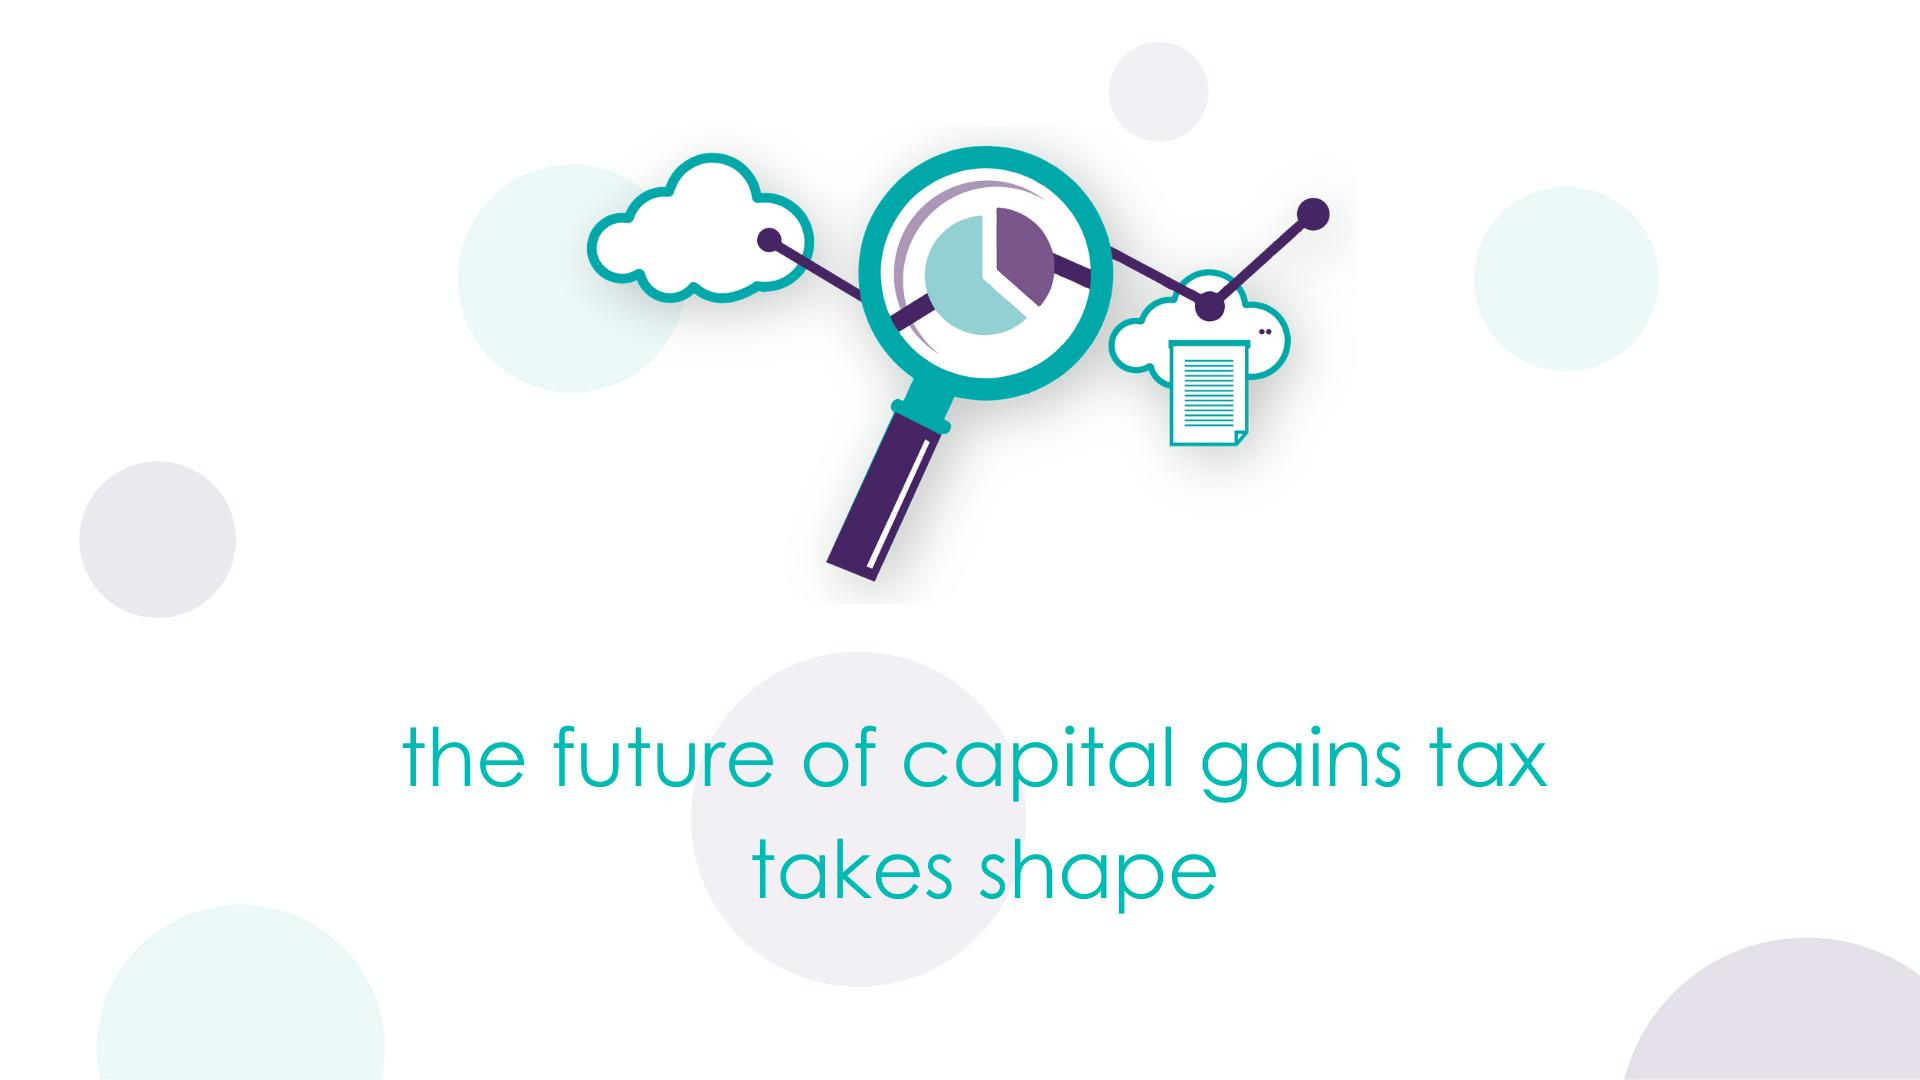 The future of capital gains tax takes shape